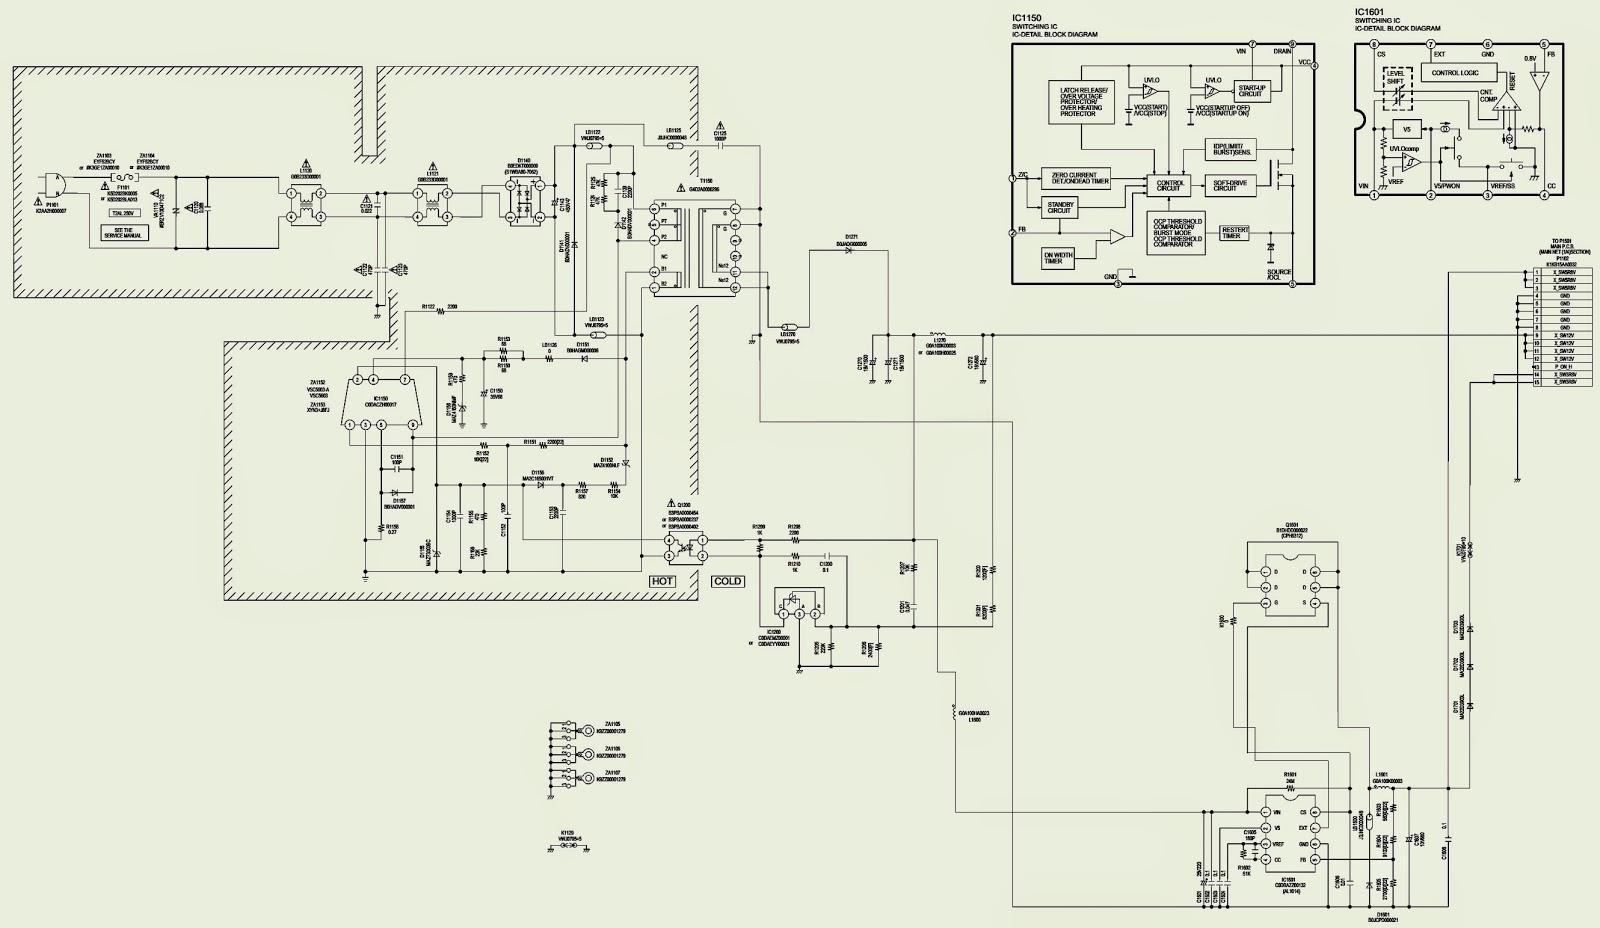 panasonic dmr es18gca dvd recorder smps power supply. Black Bedroom Furniture Sets. Home Design Ideas